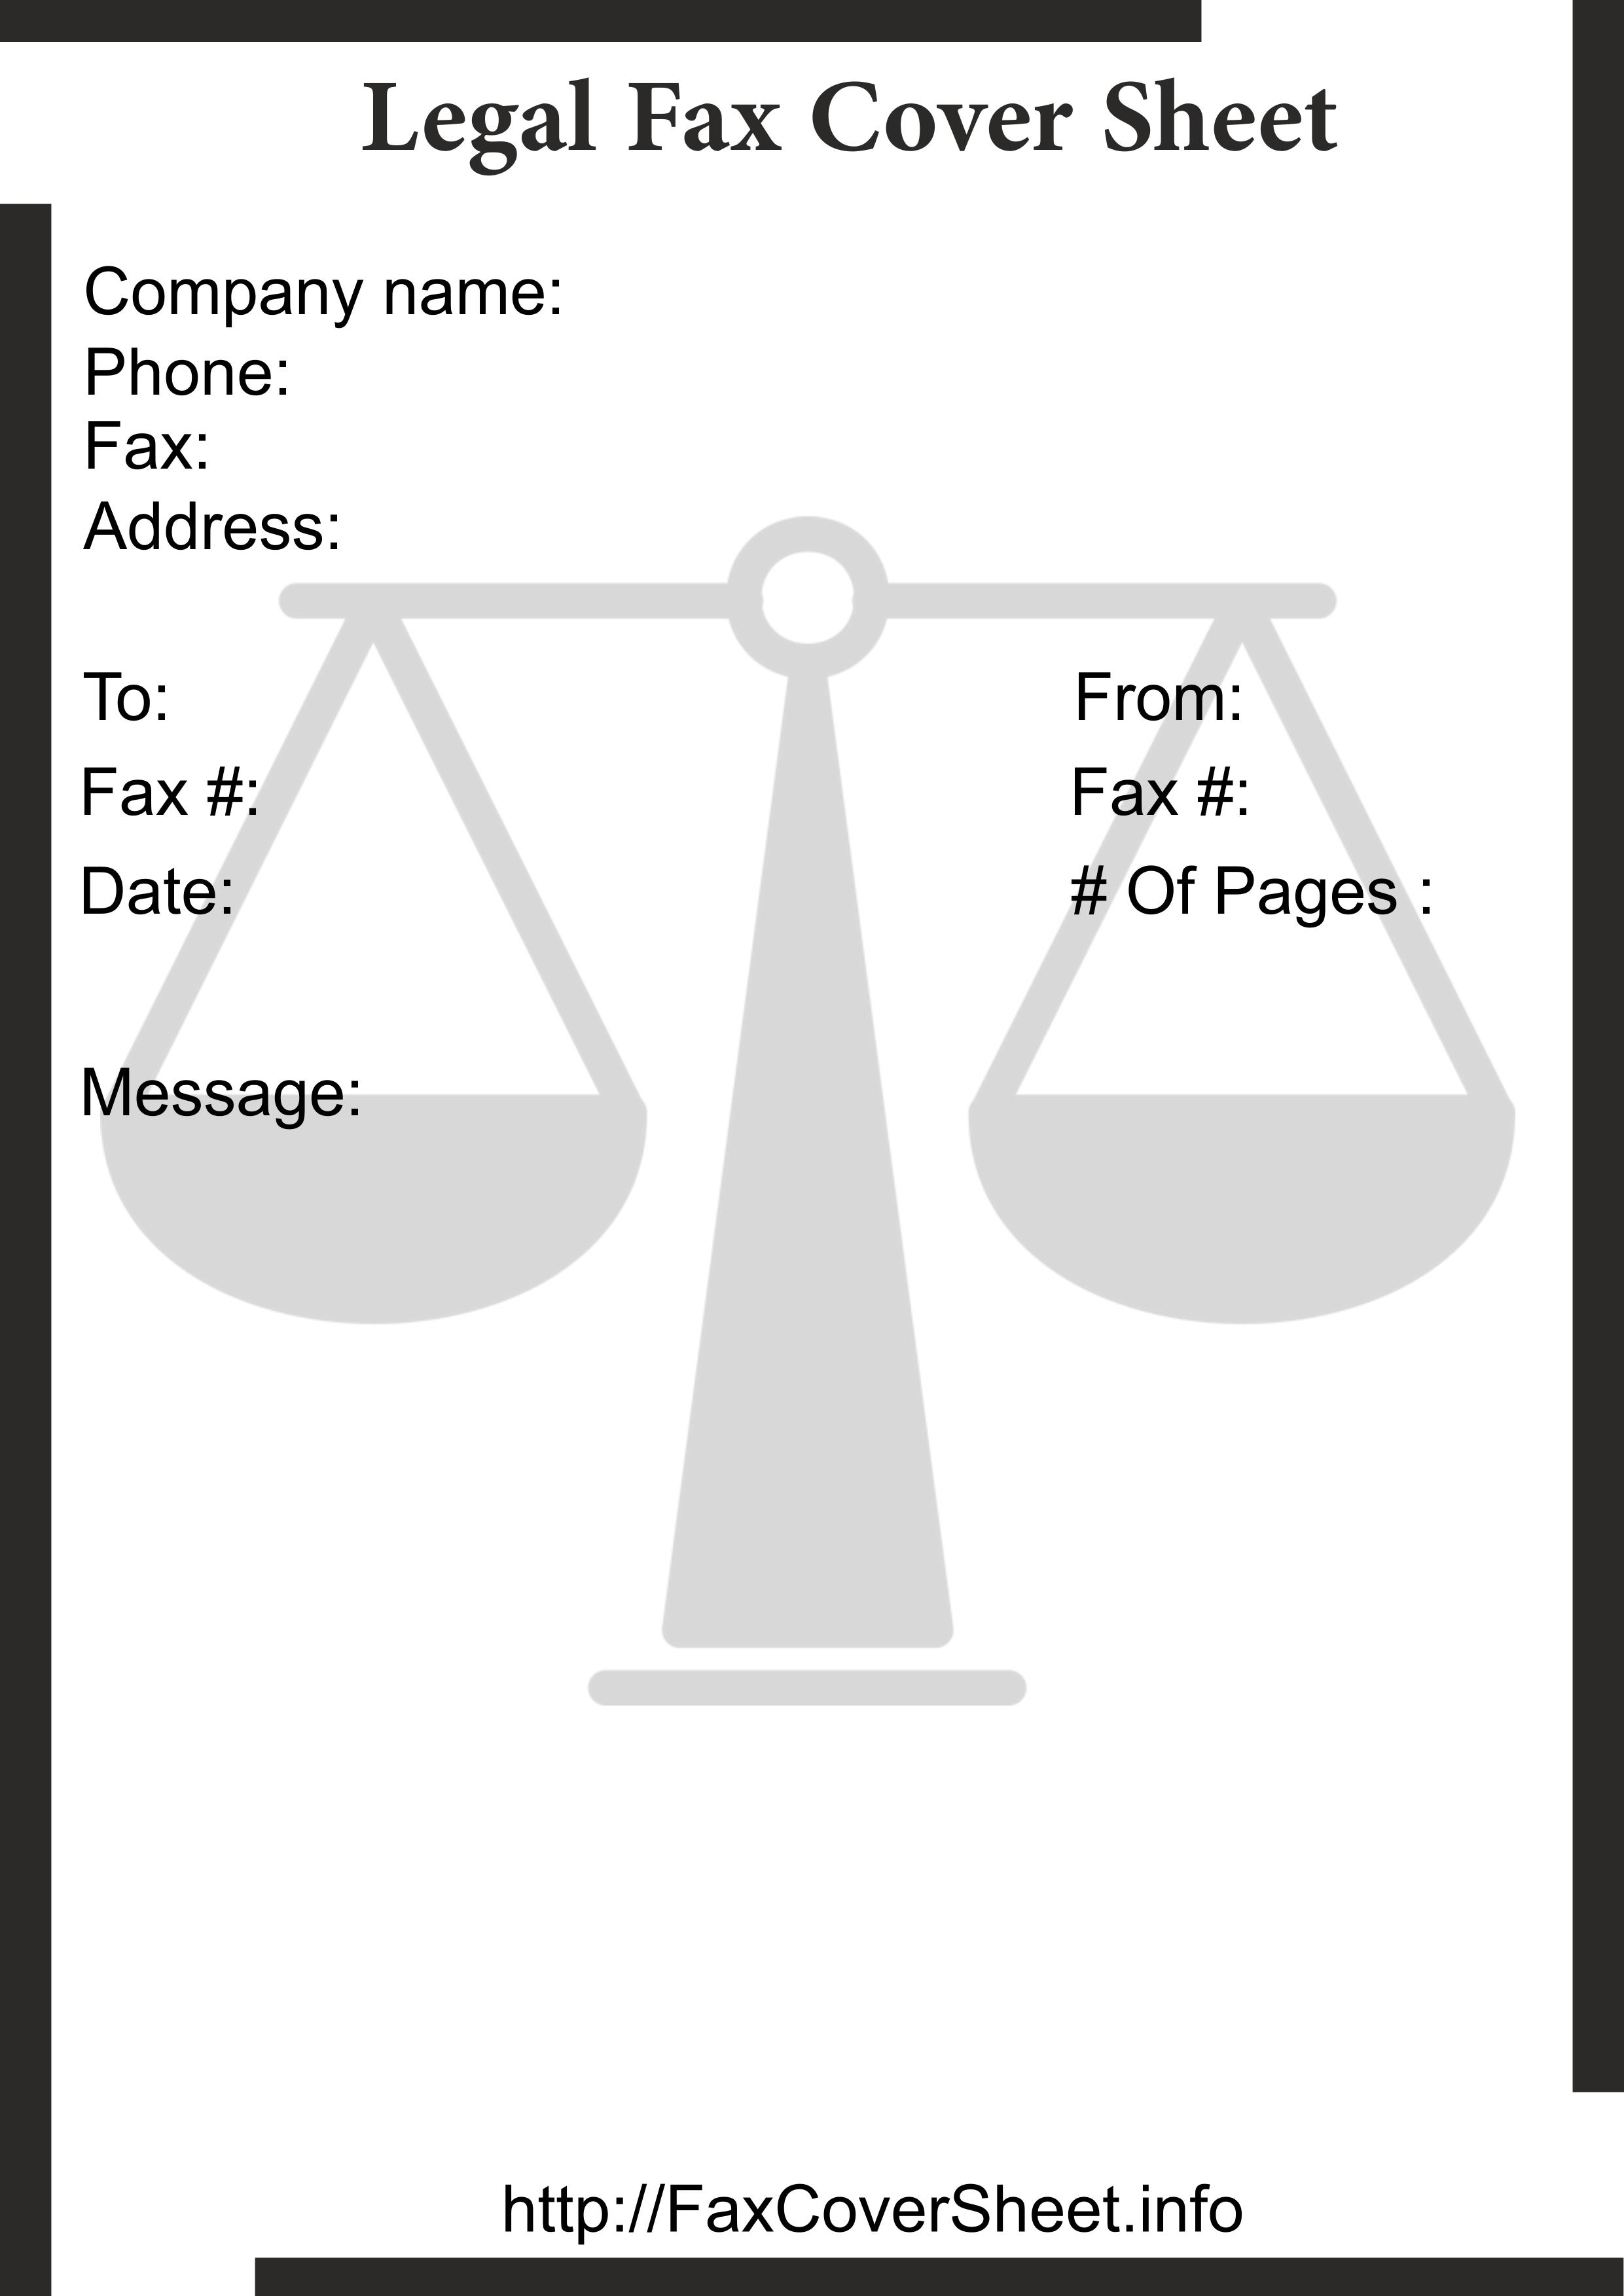 Legal Fax Cover Sheet Templates